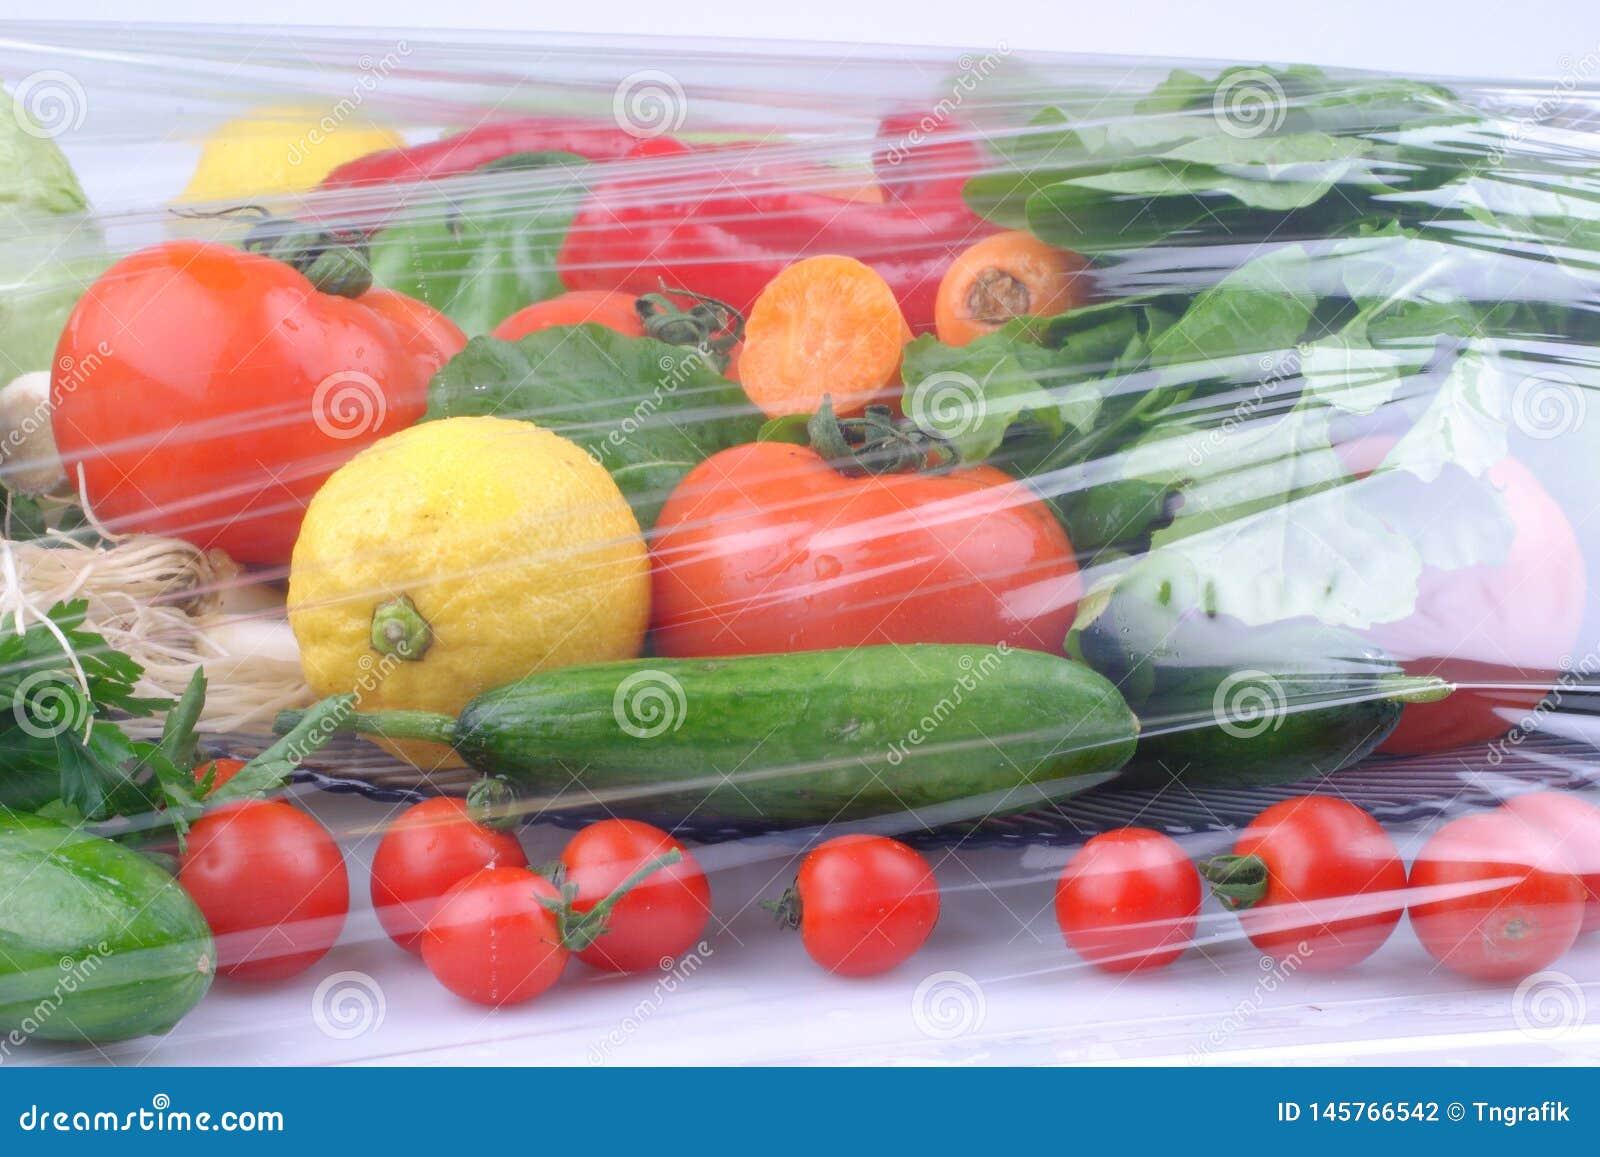 E r 黄瓜,圆白菜,胡椒,沙拉,红萝卜,硬花甘蓝,lettuc